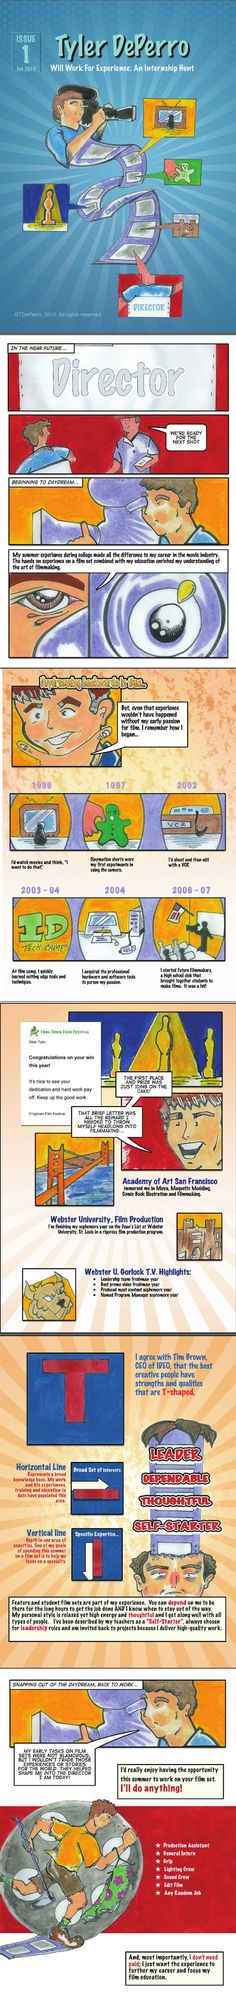 visual resume example cartoon